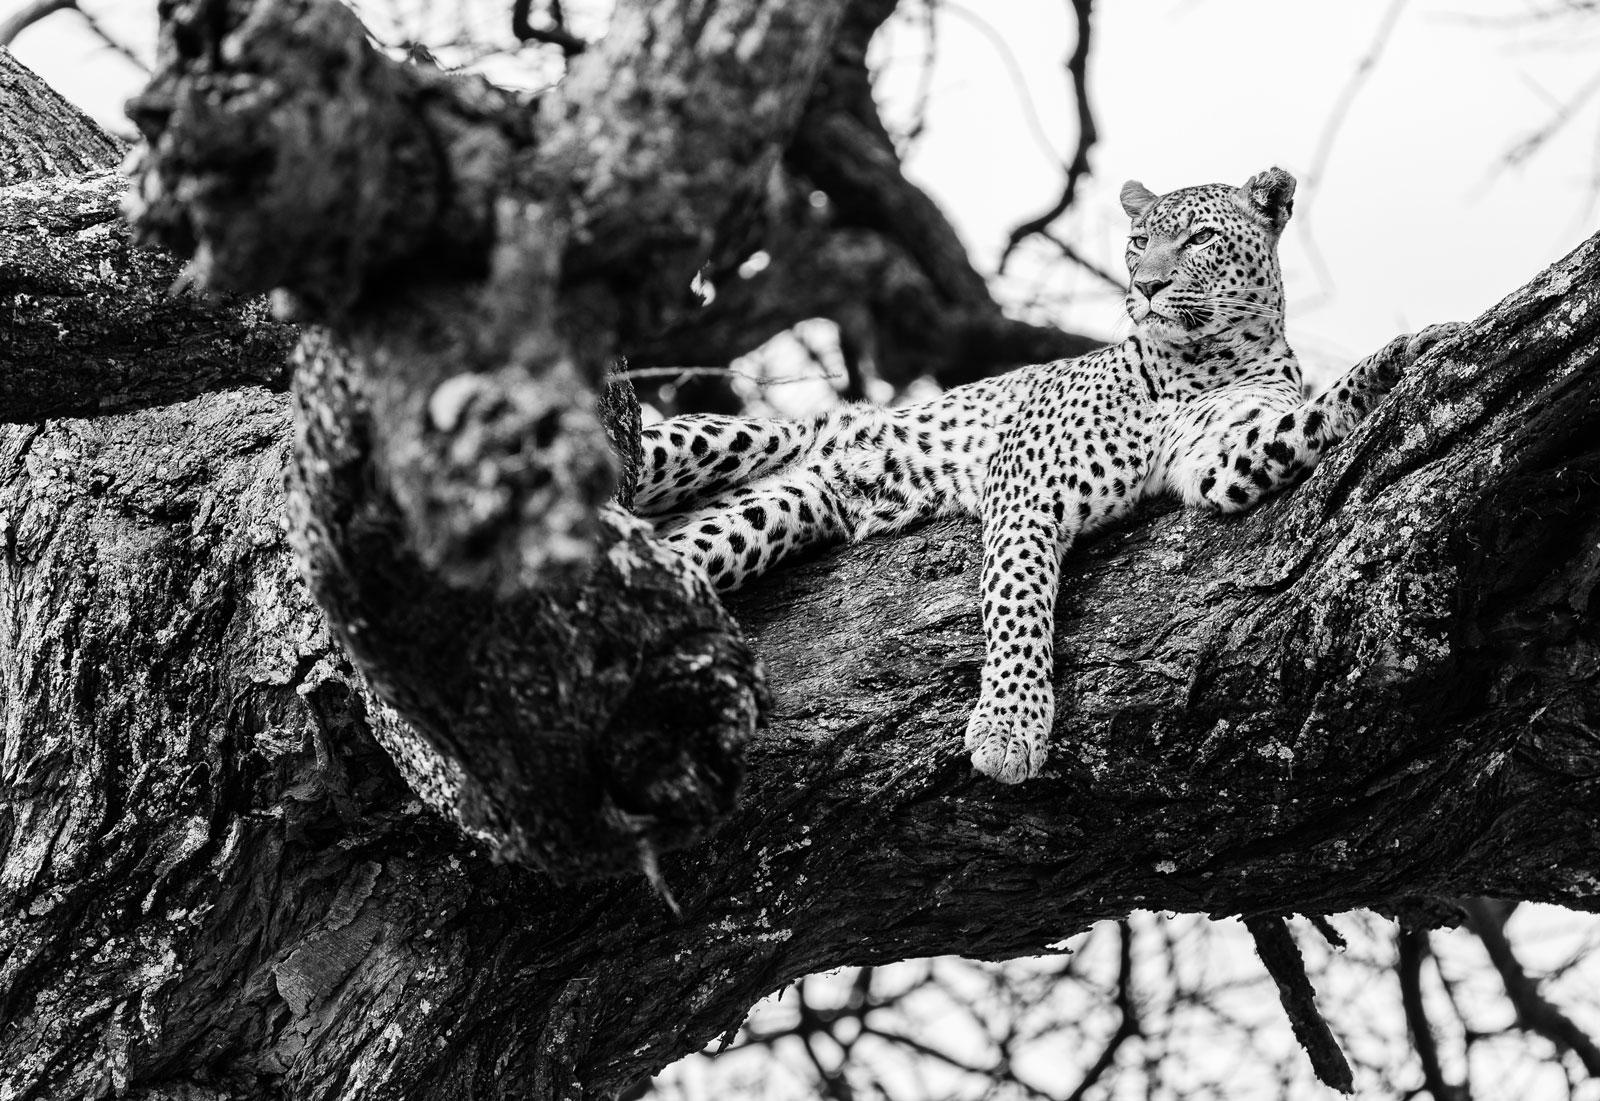 alexa-wright-leopard.jpg